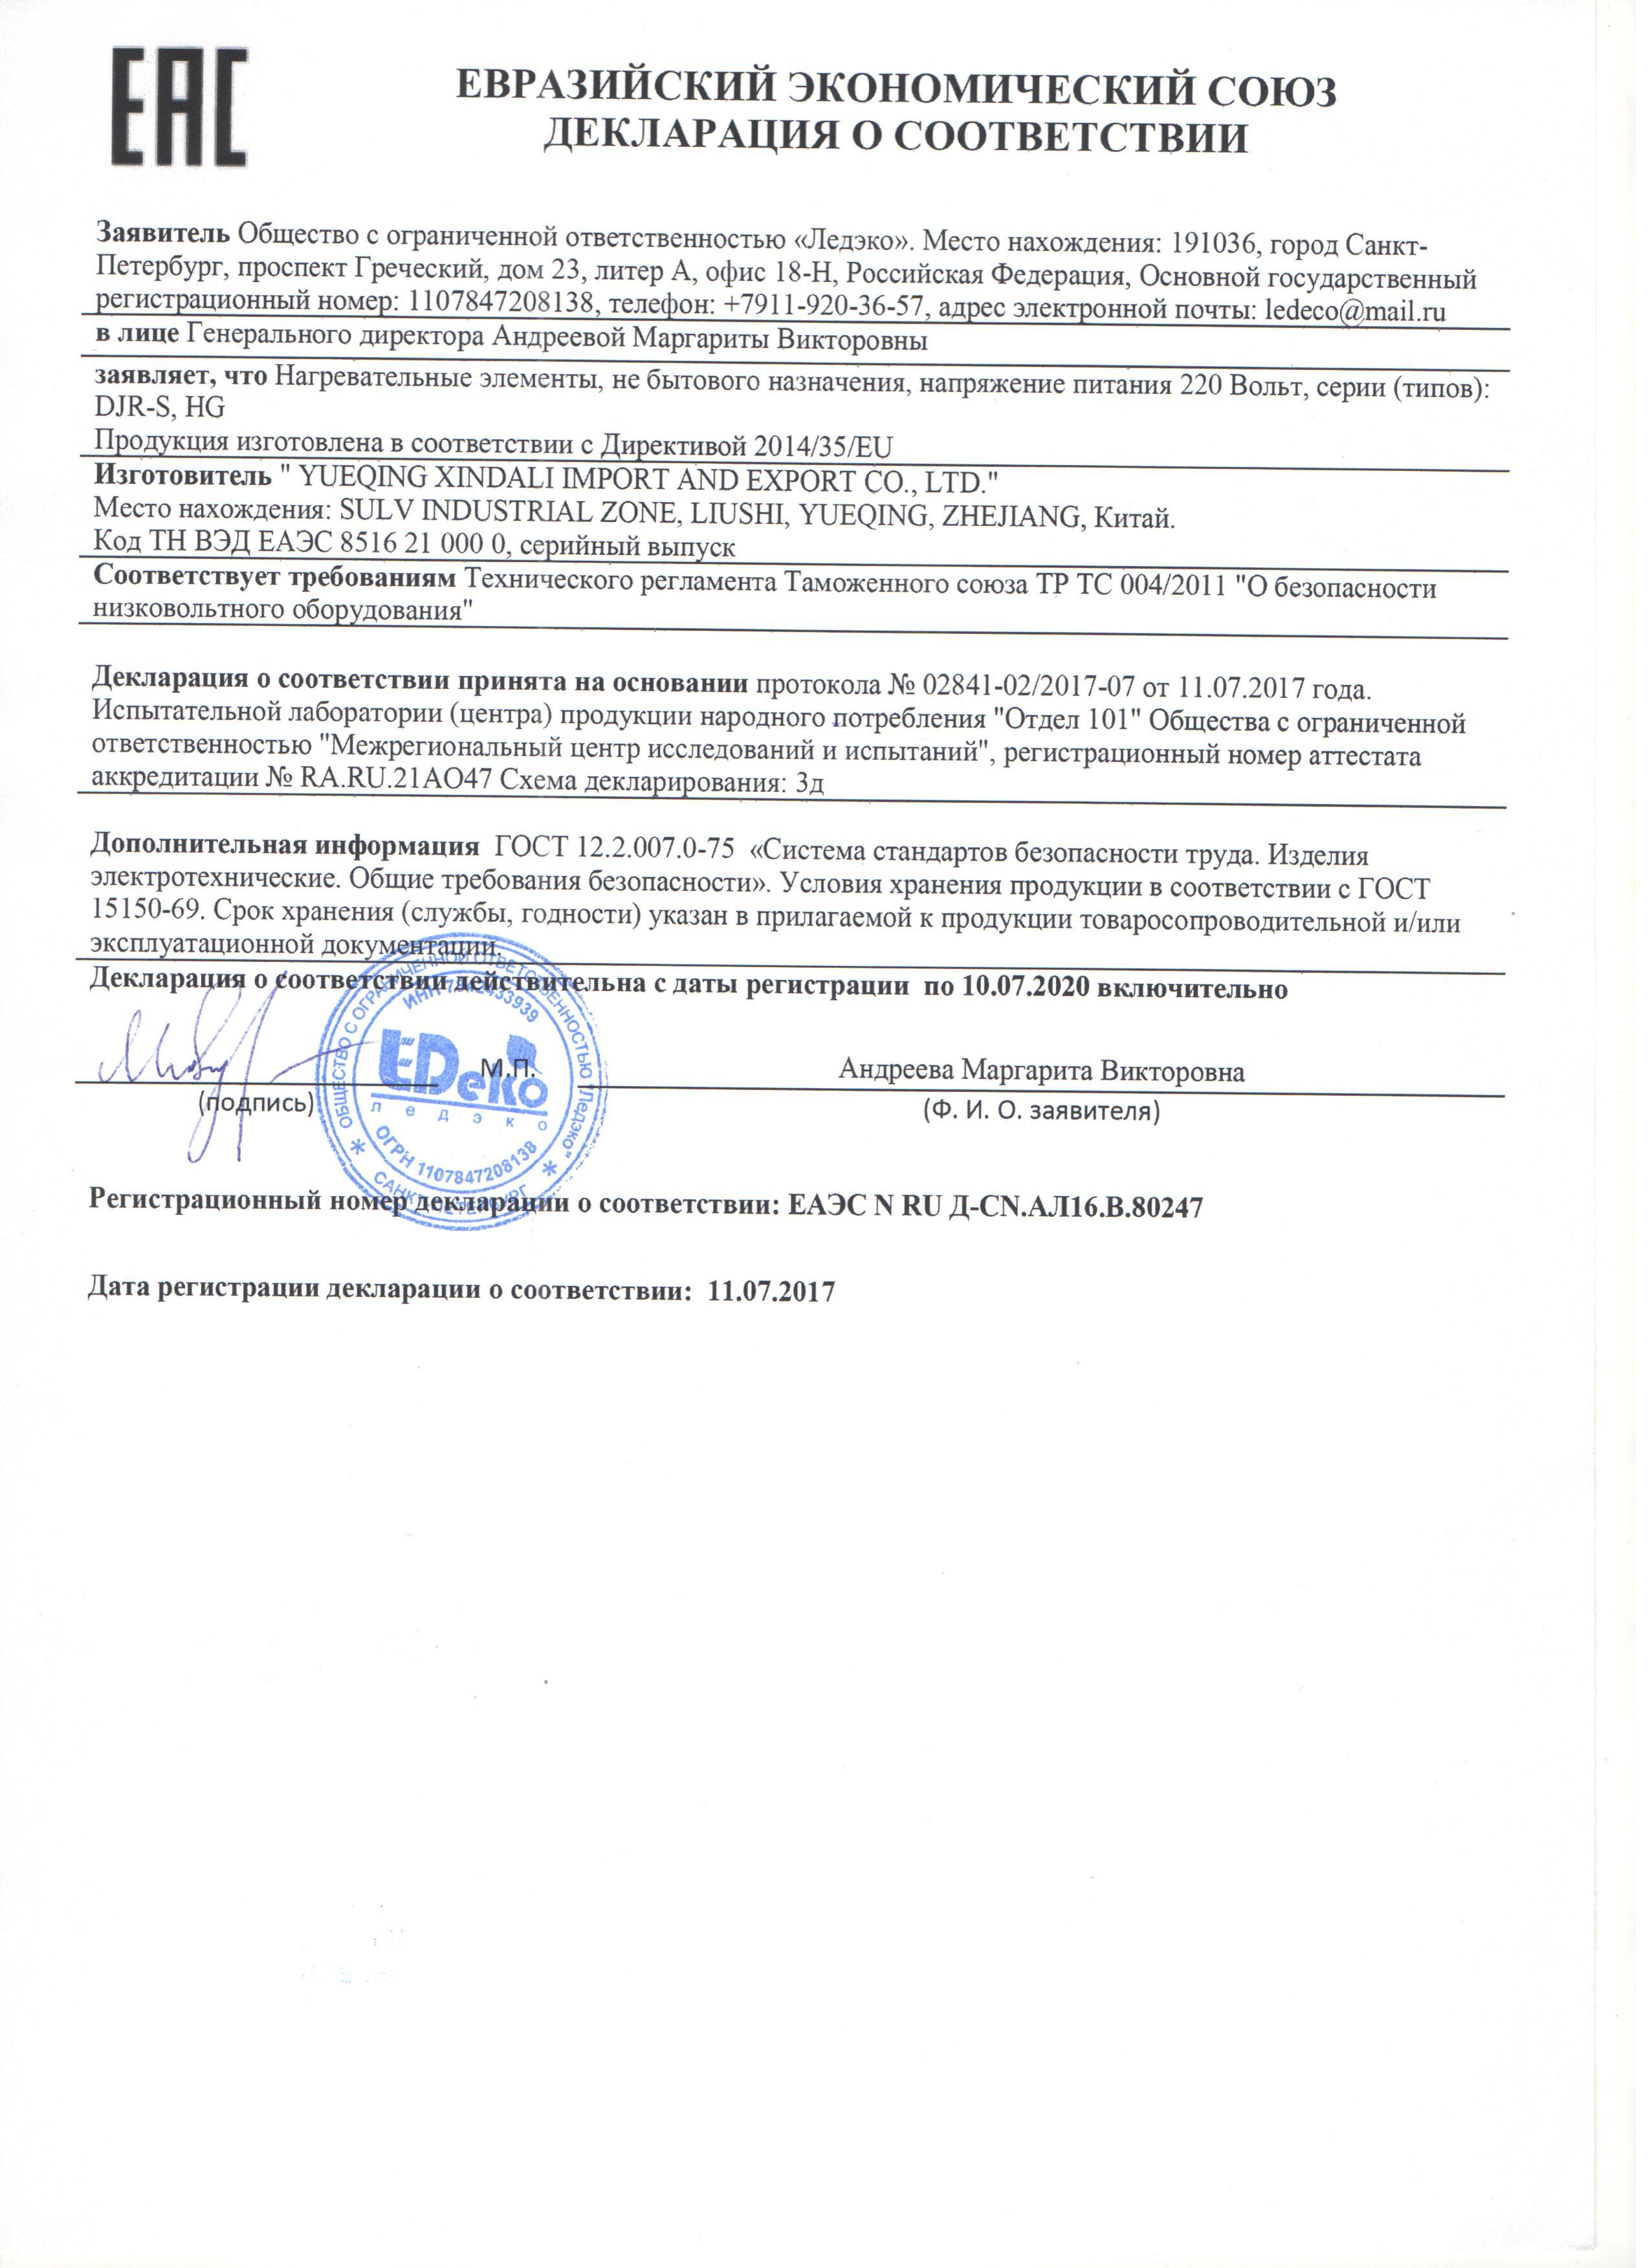 http://montagesystems.ru/files/Декларация%20на%20Нагреватели%20до%2010.07.2020.jpeg